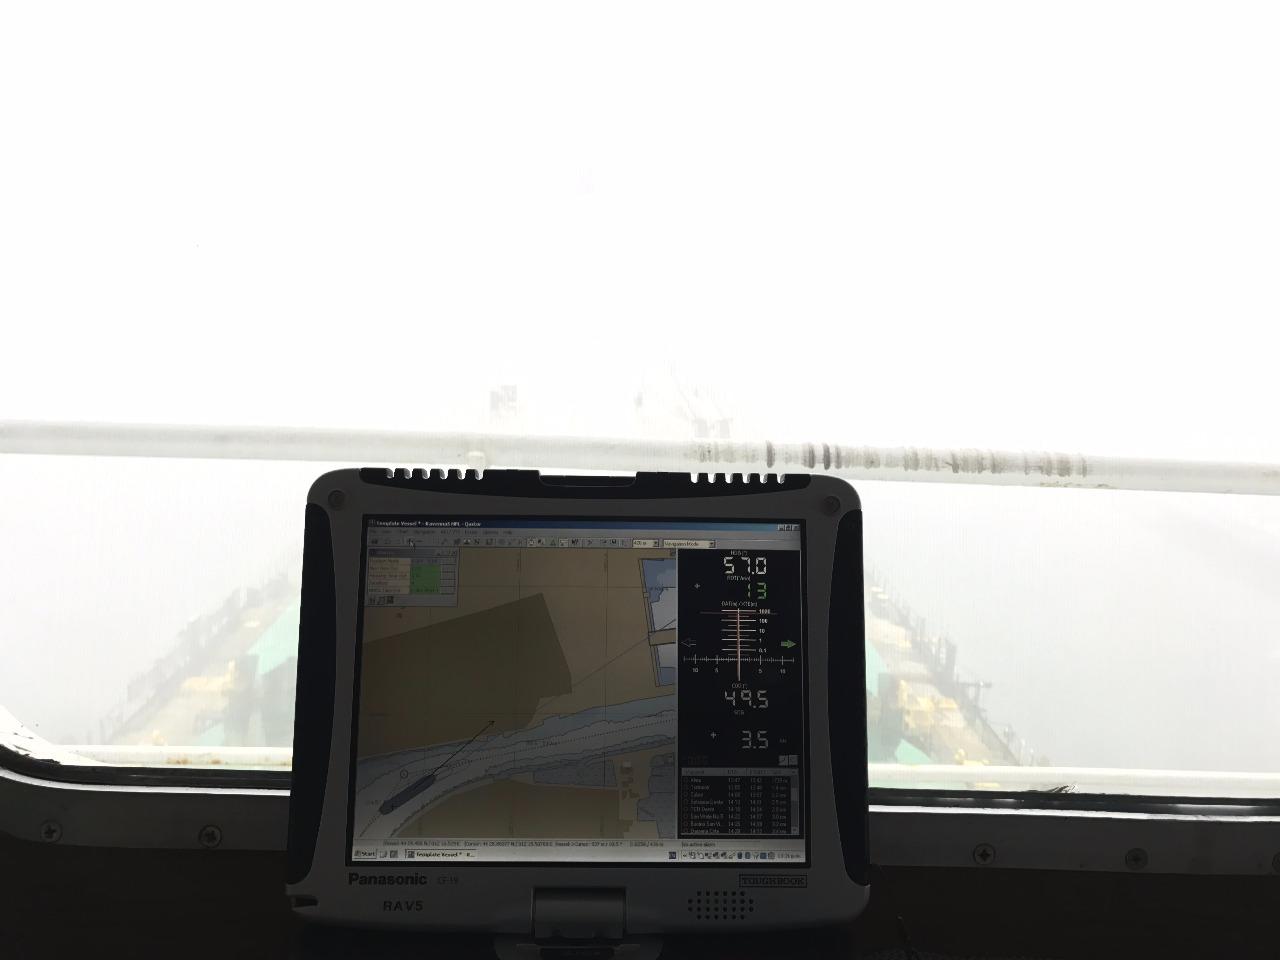 PPU Nebbia